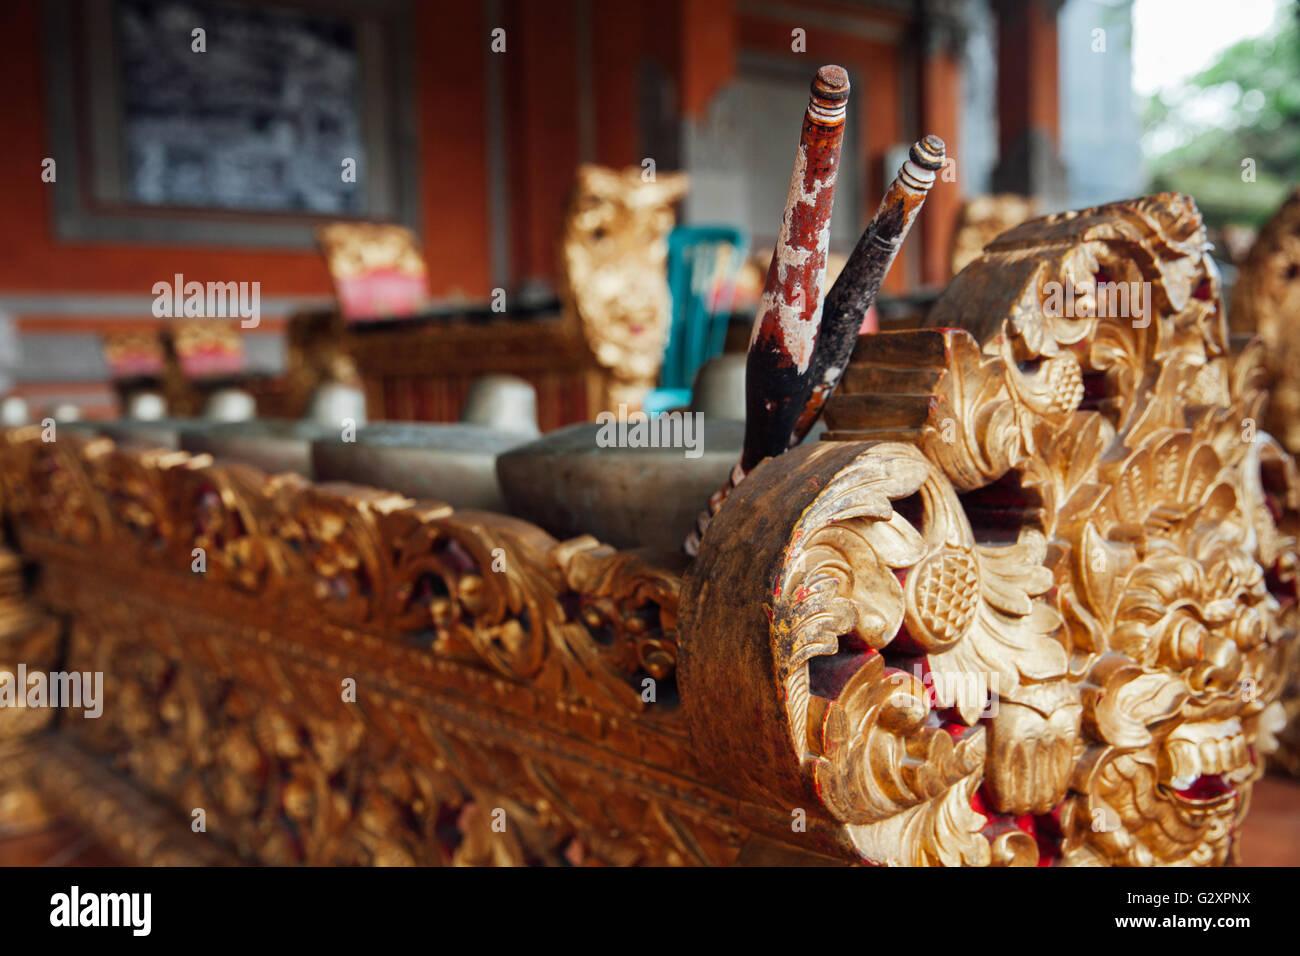 Traditional balinese percussive music instruments instruments for 'Gamelan' ensemble music, Ubud, Bali, - Stock Image